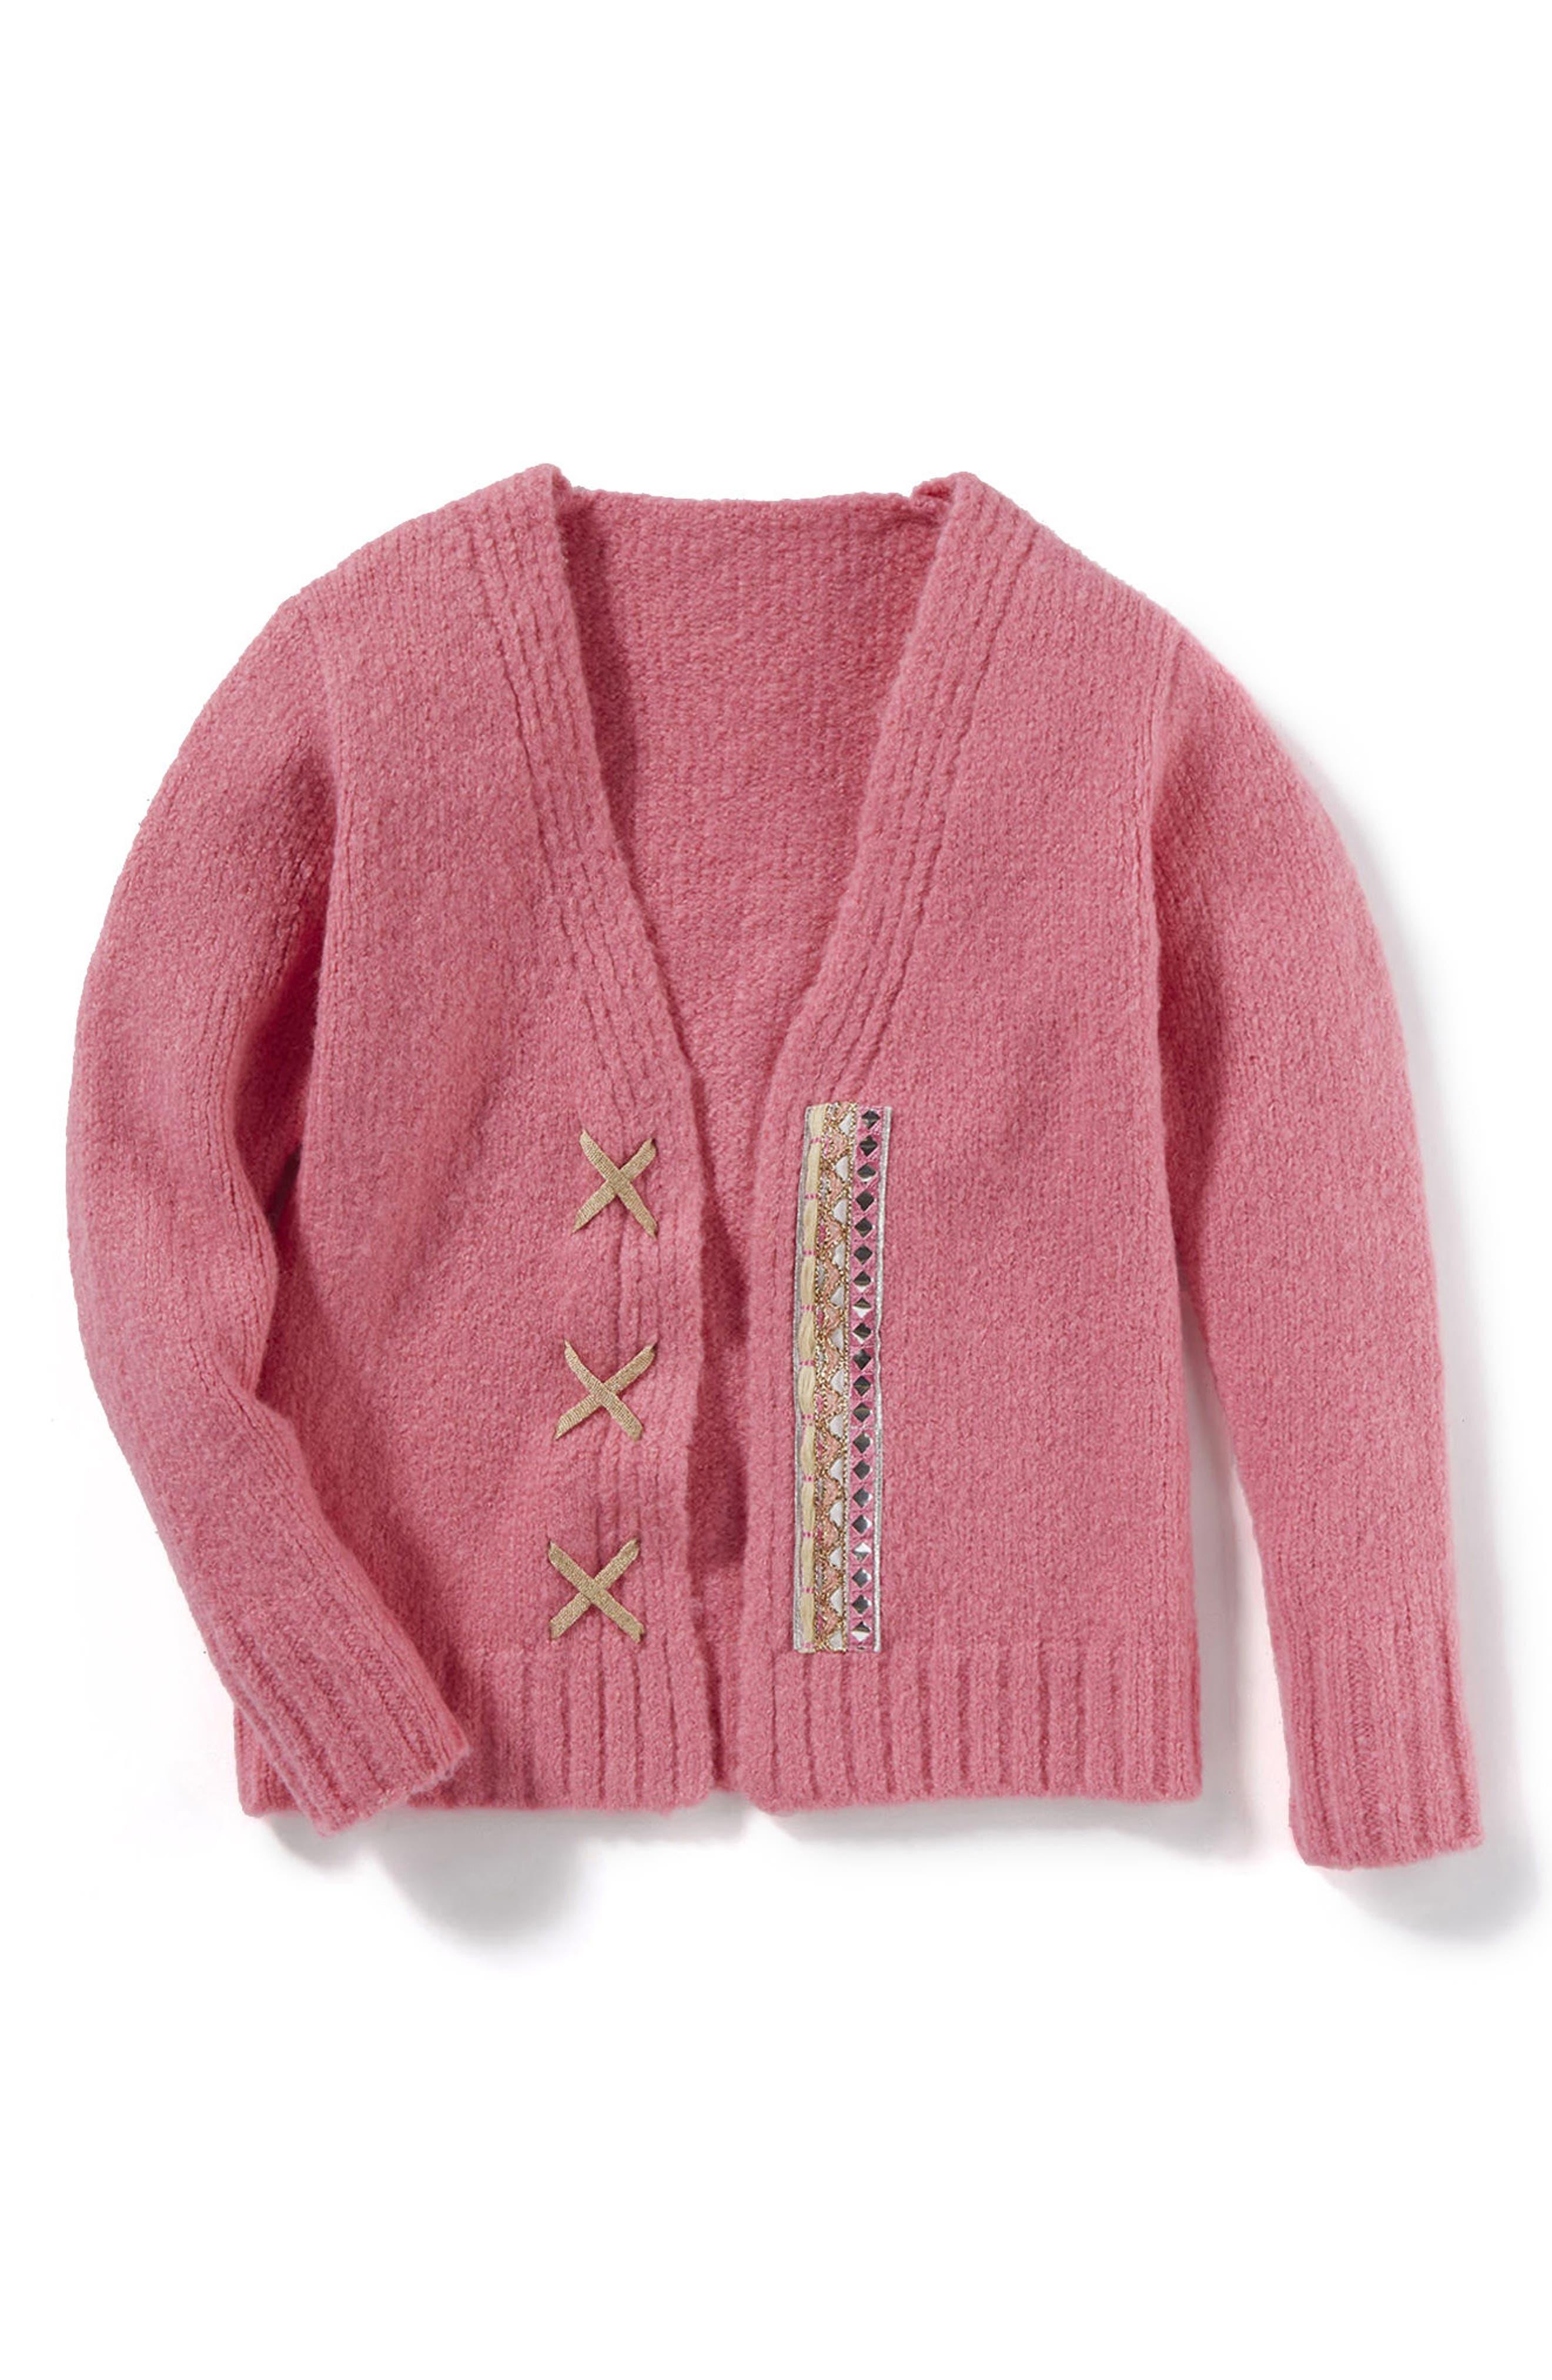 Ashley Cardigan,                         Main,                         color, Pink